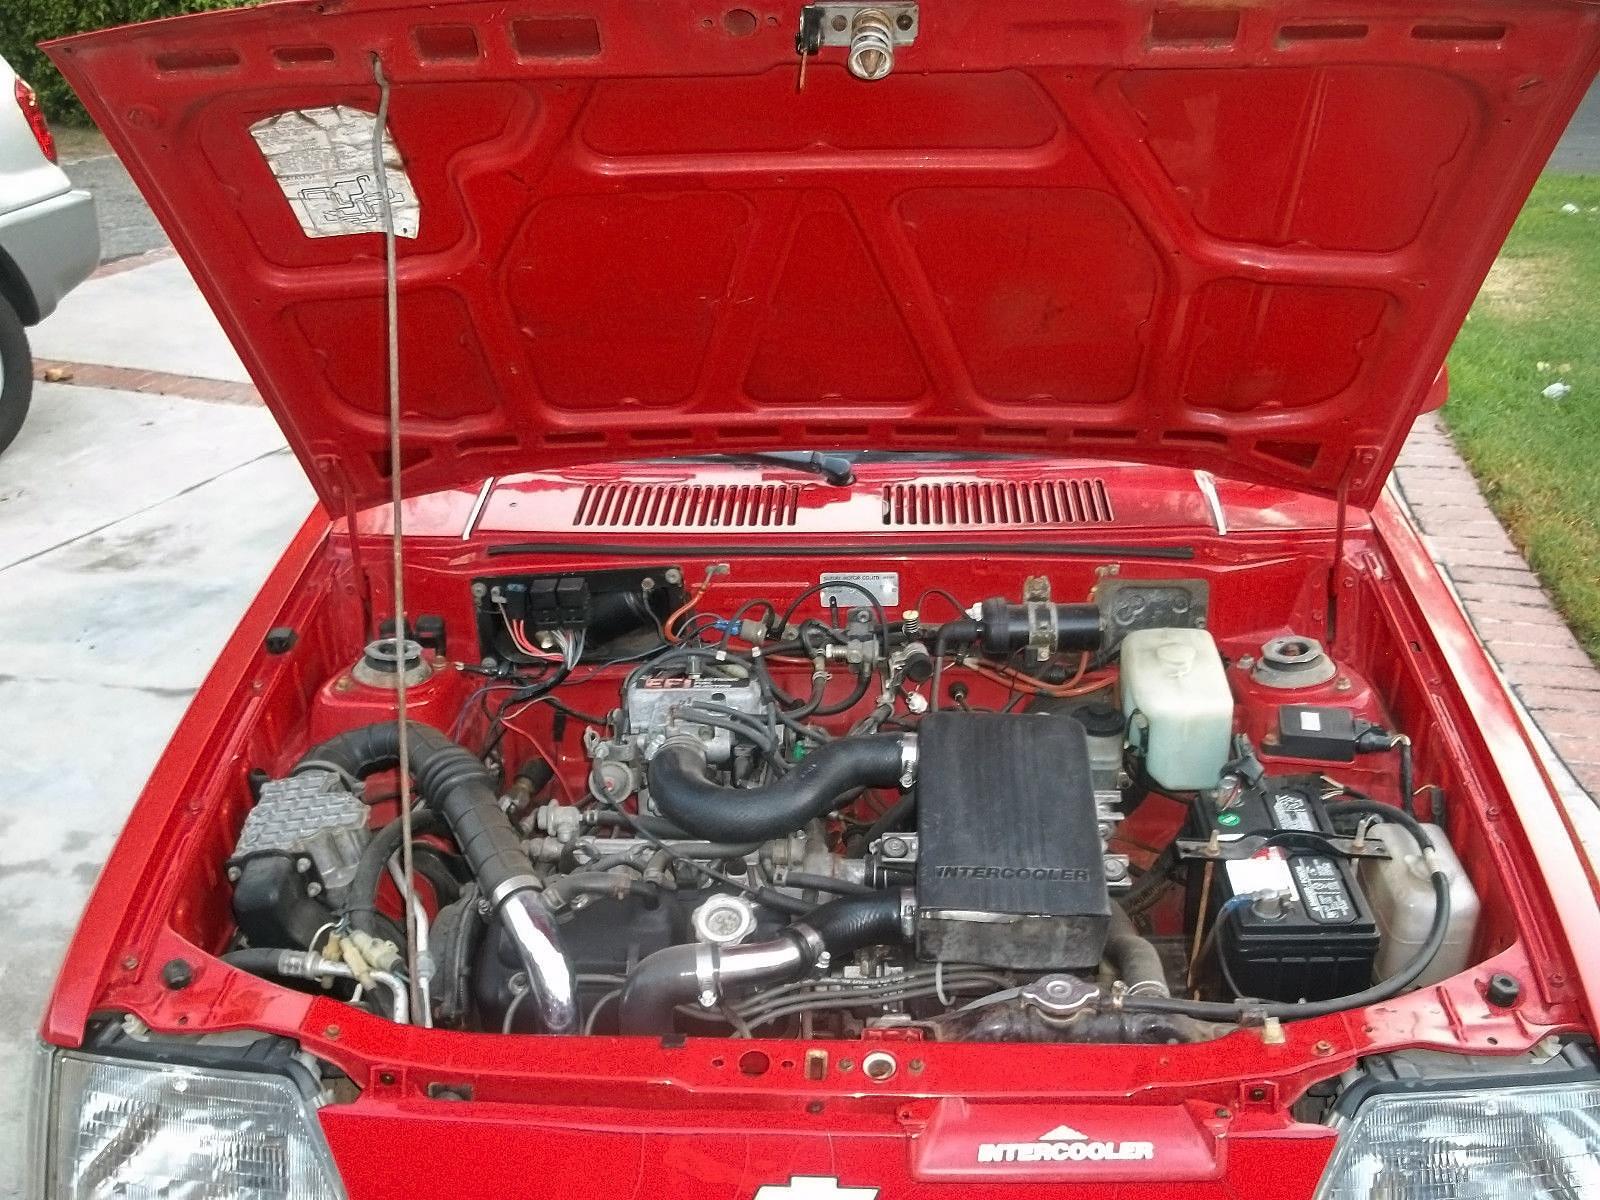 1987 Chevy Sprint Turbo Wiring Diagram Red Rocket Chevrolet 1600x1200